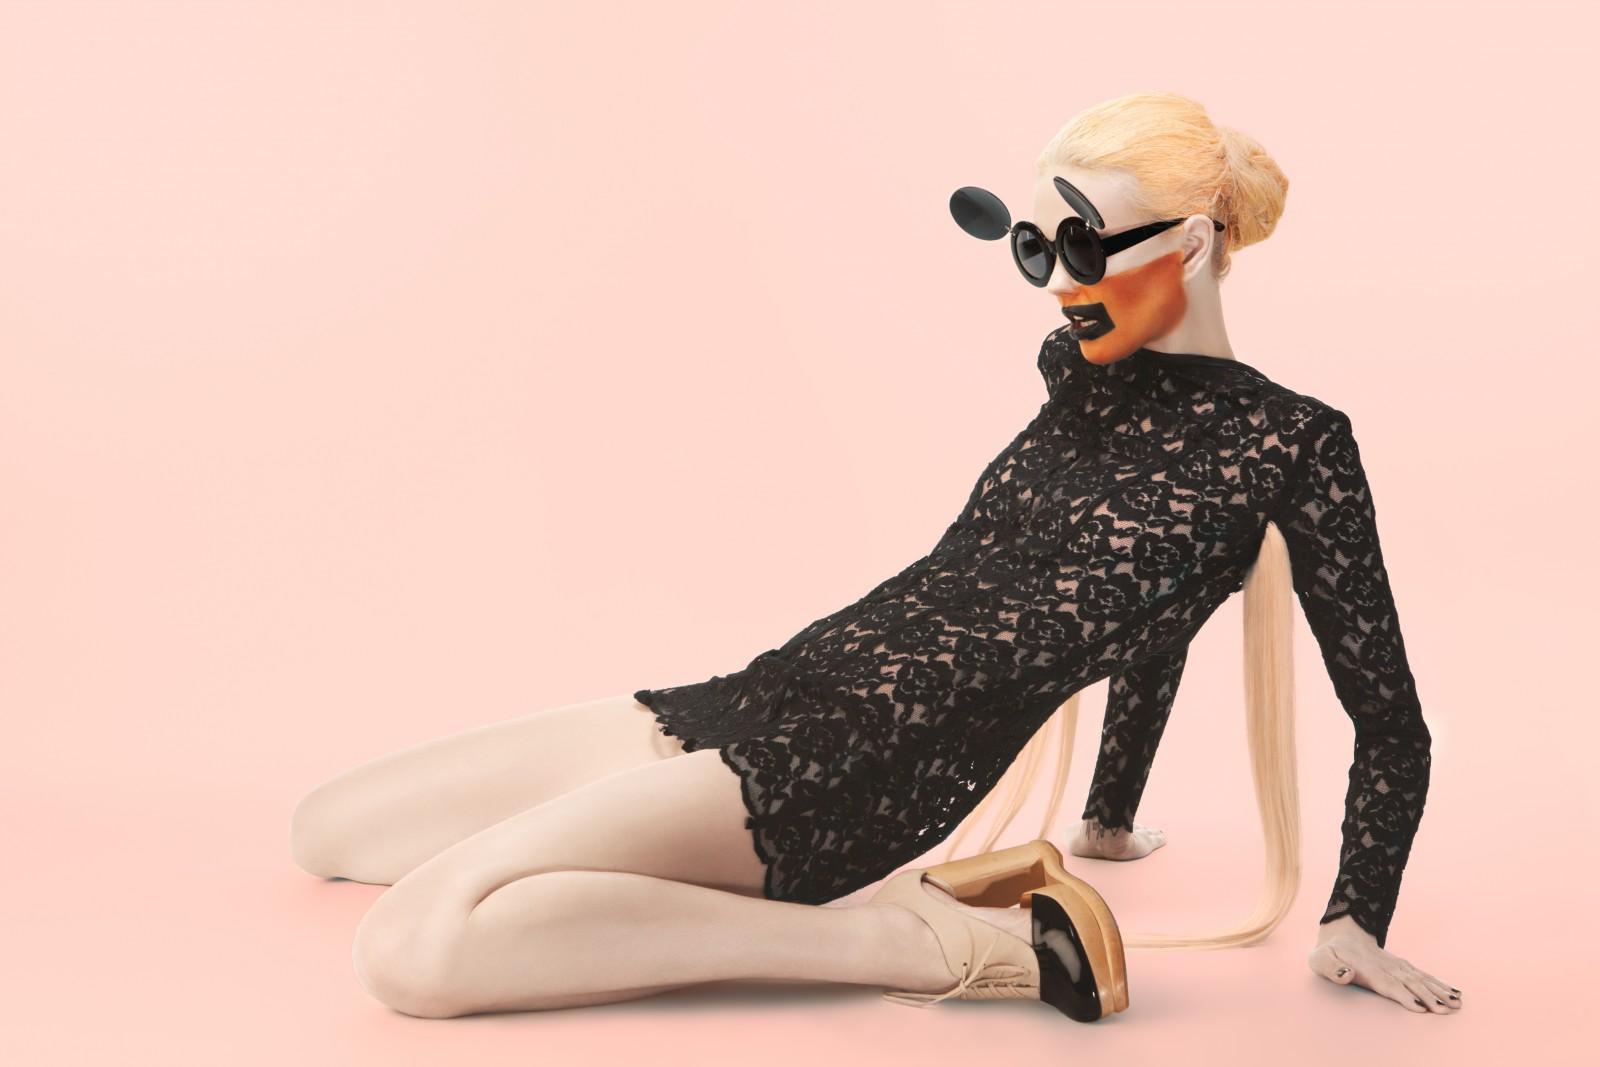 Bonnie Strange for Marina Ballerina PSD-3